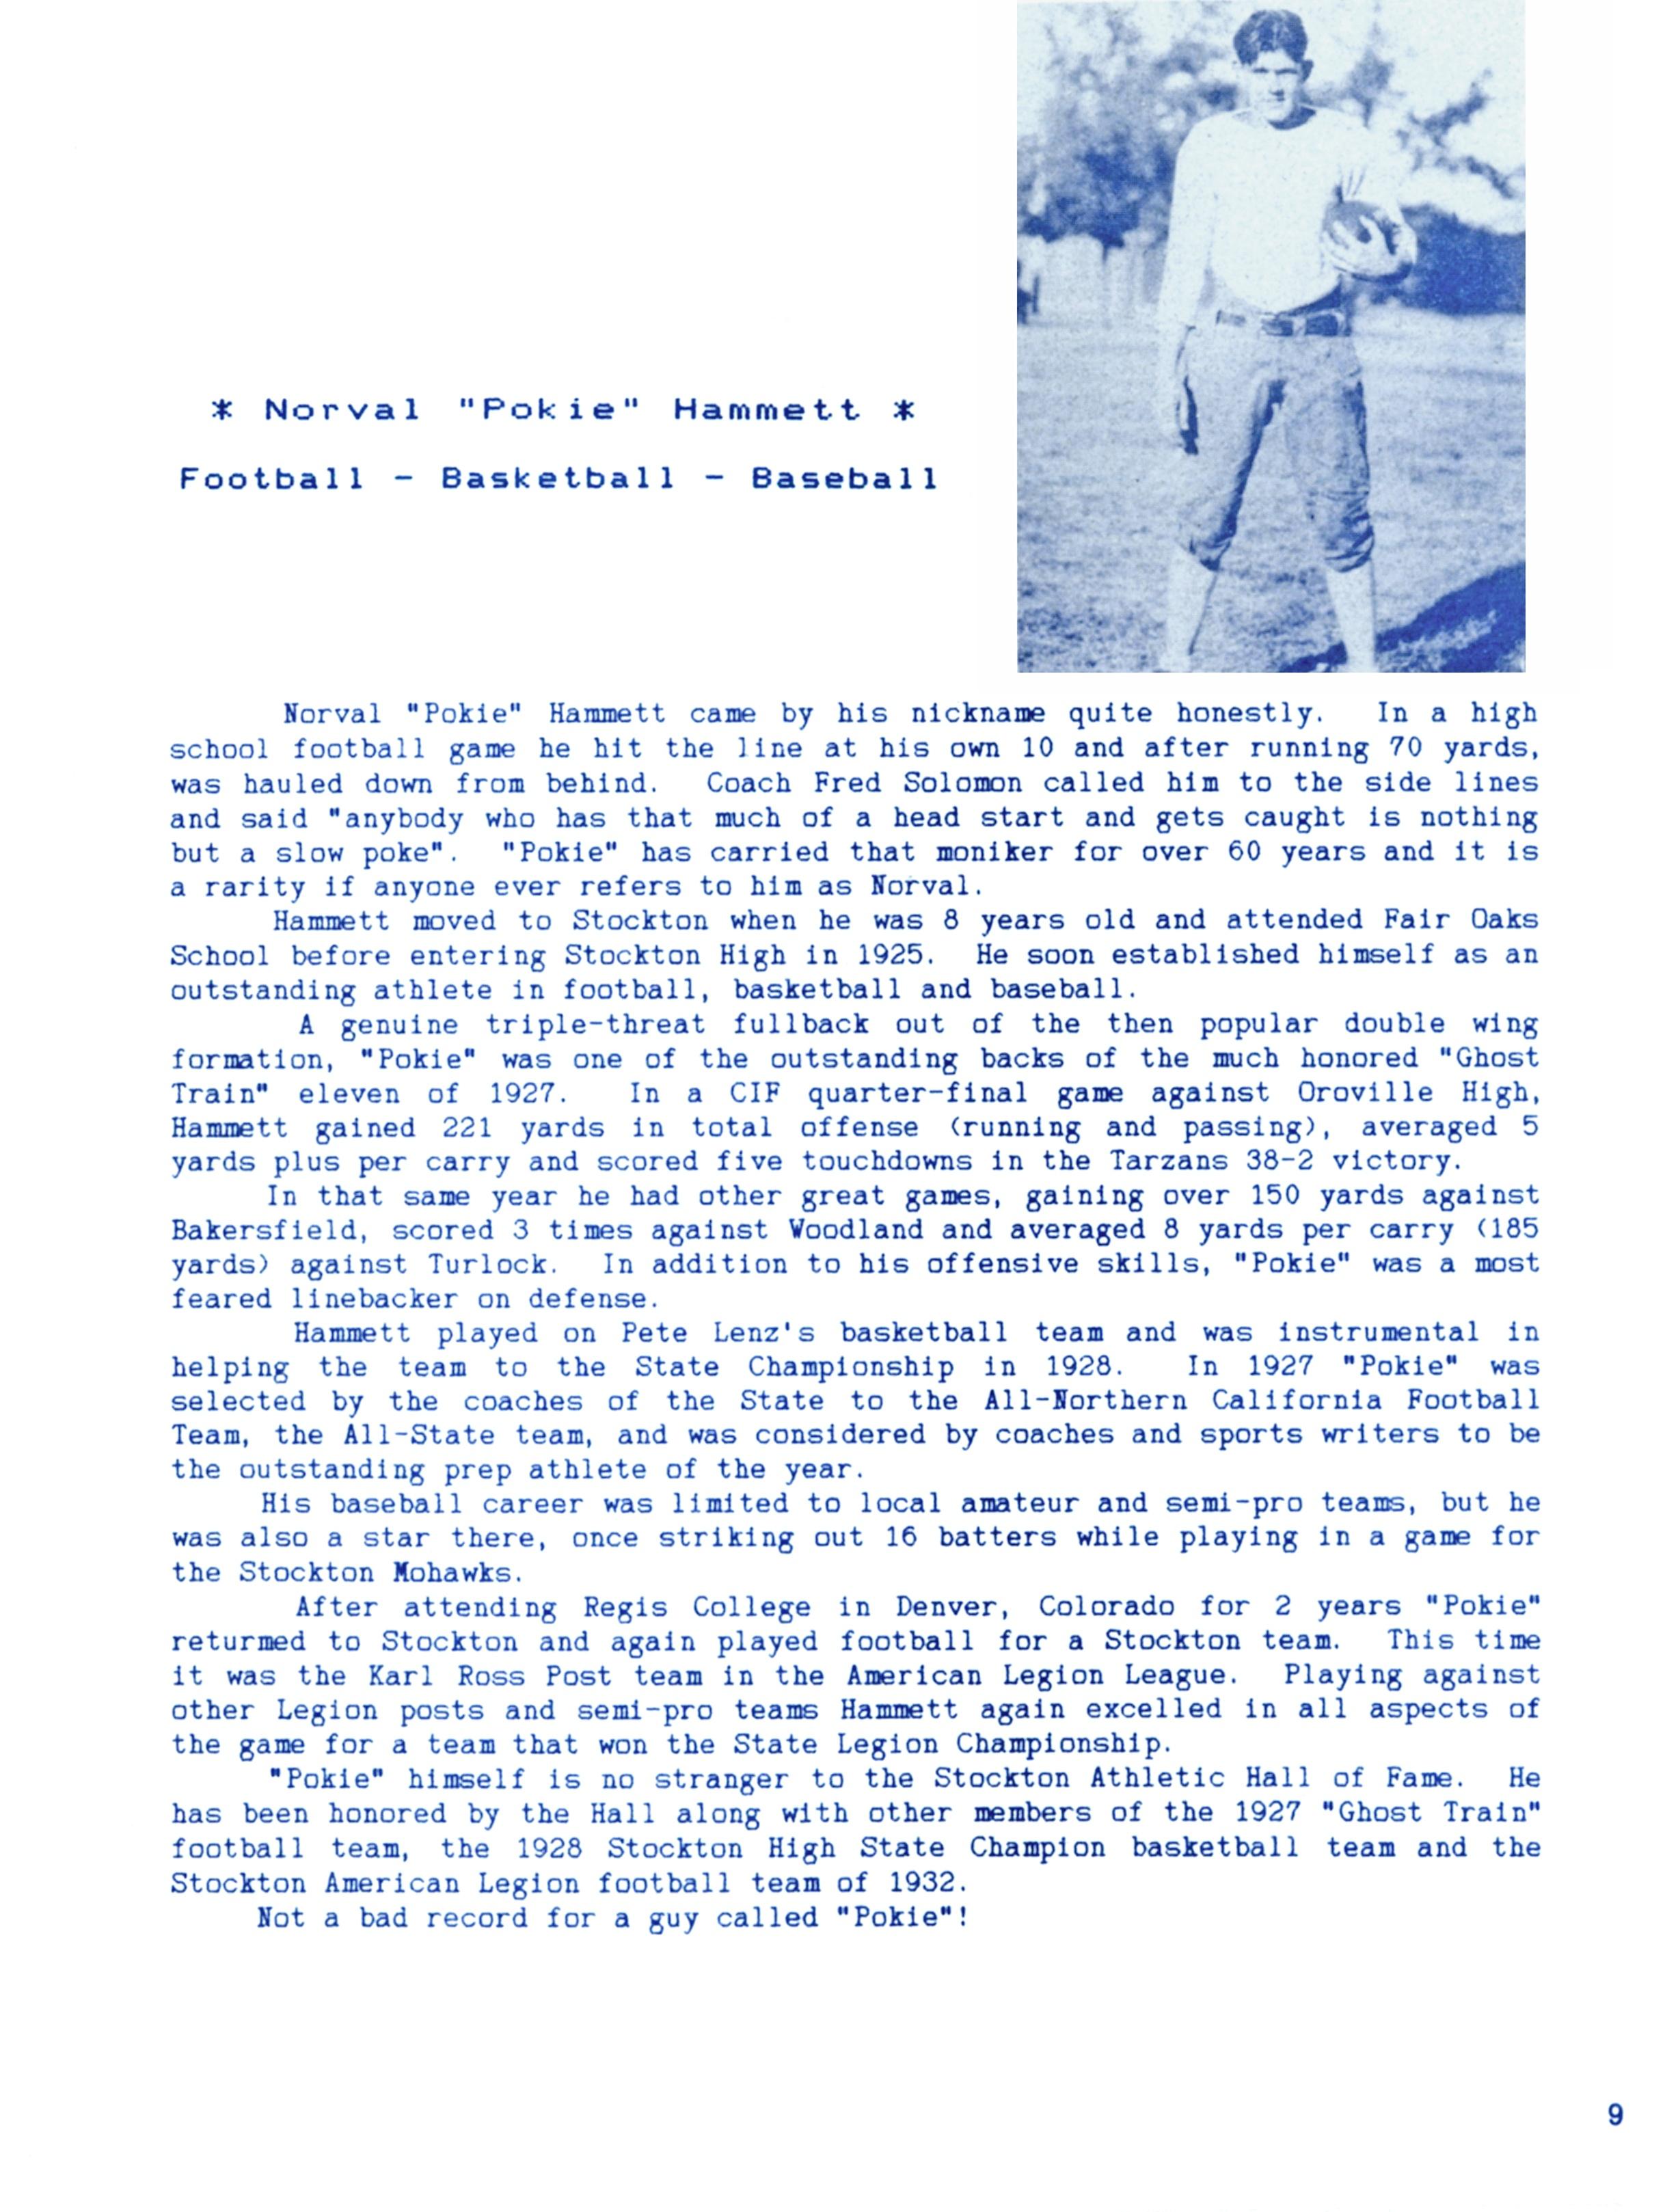 Norval-Pokie-Hammett-88_11